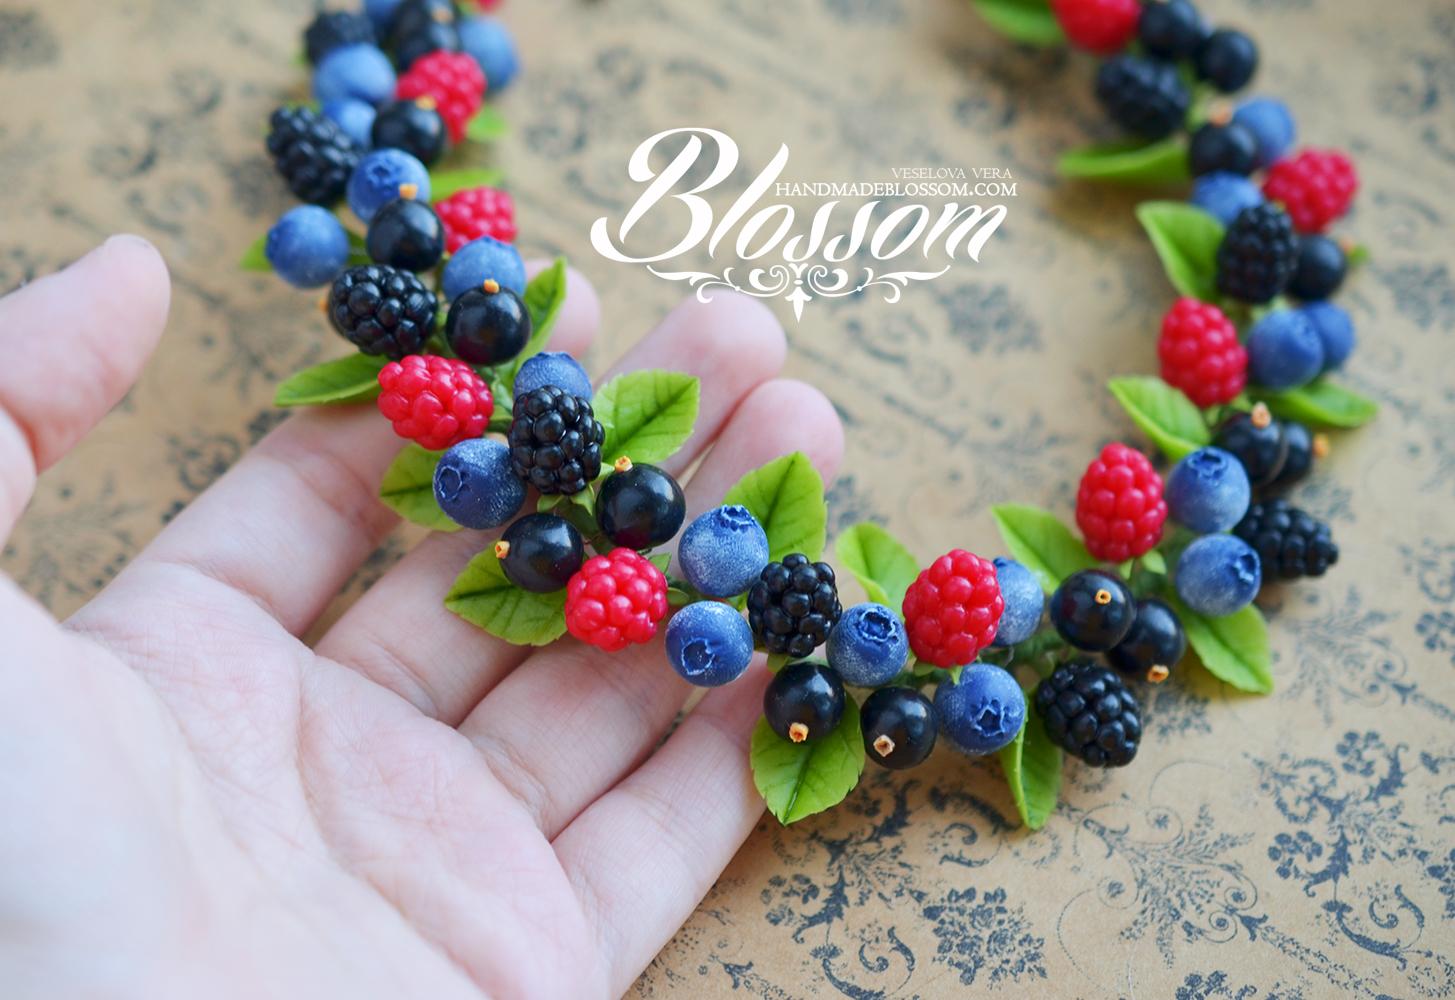 малина,вишня, смородина, колье с ягодами,handmade, fimo, necklace, berries, raspberry,